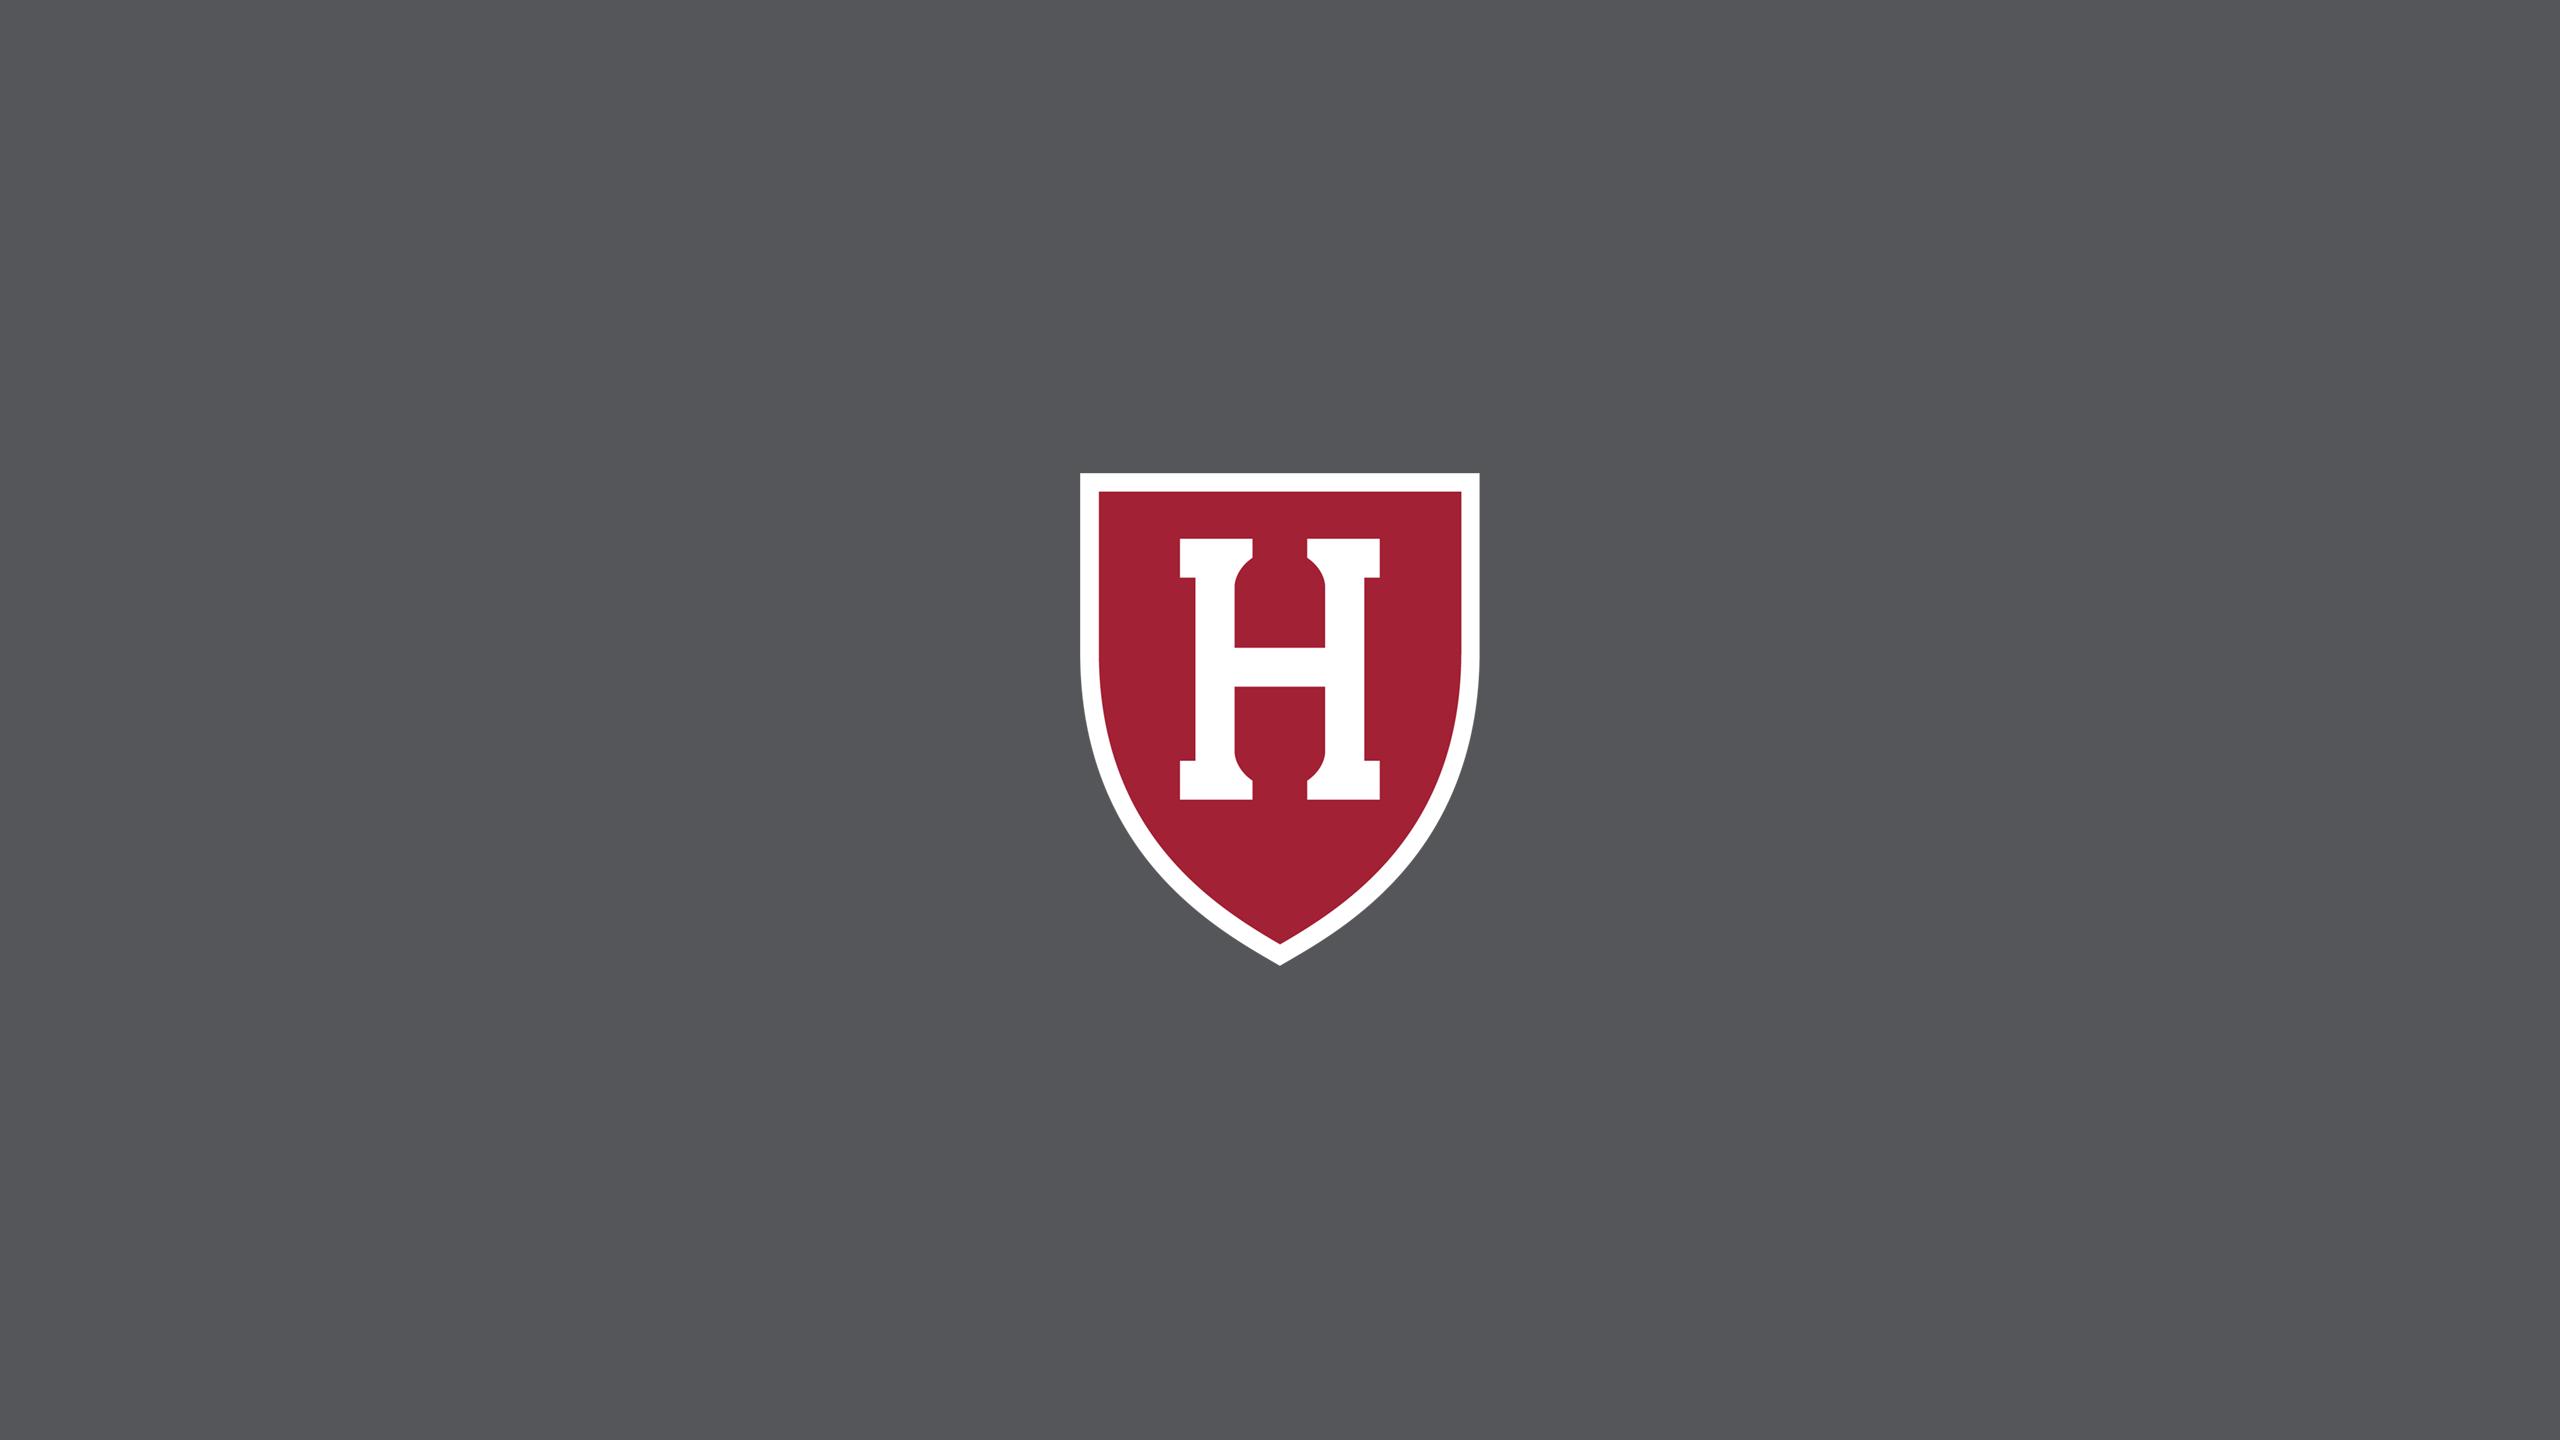 Harvard University Crimson